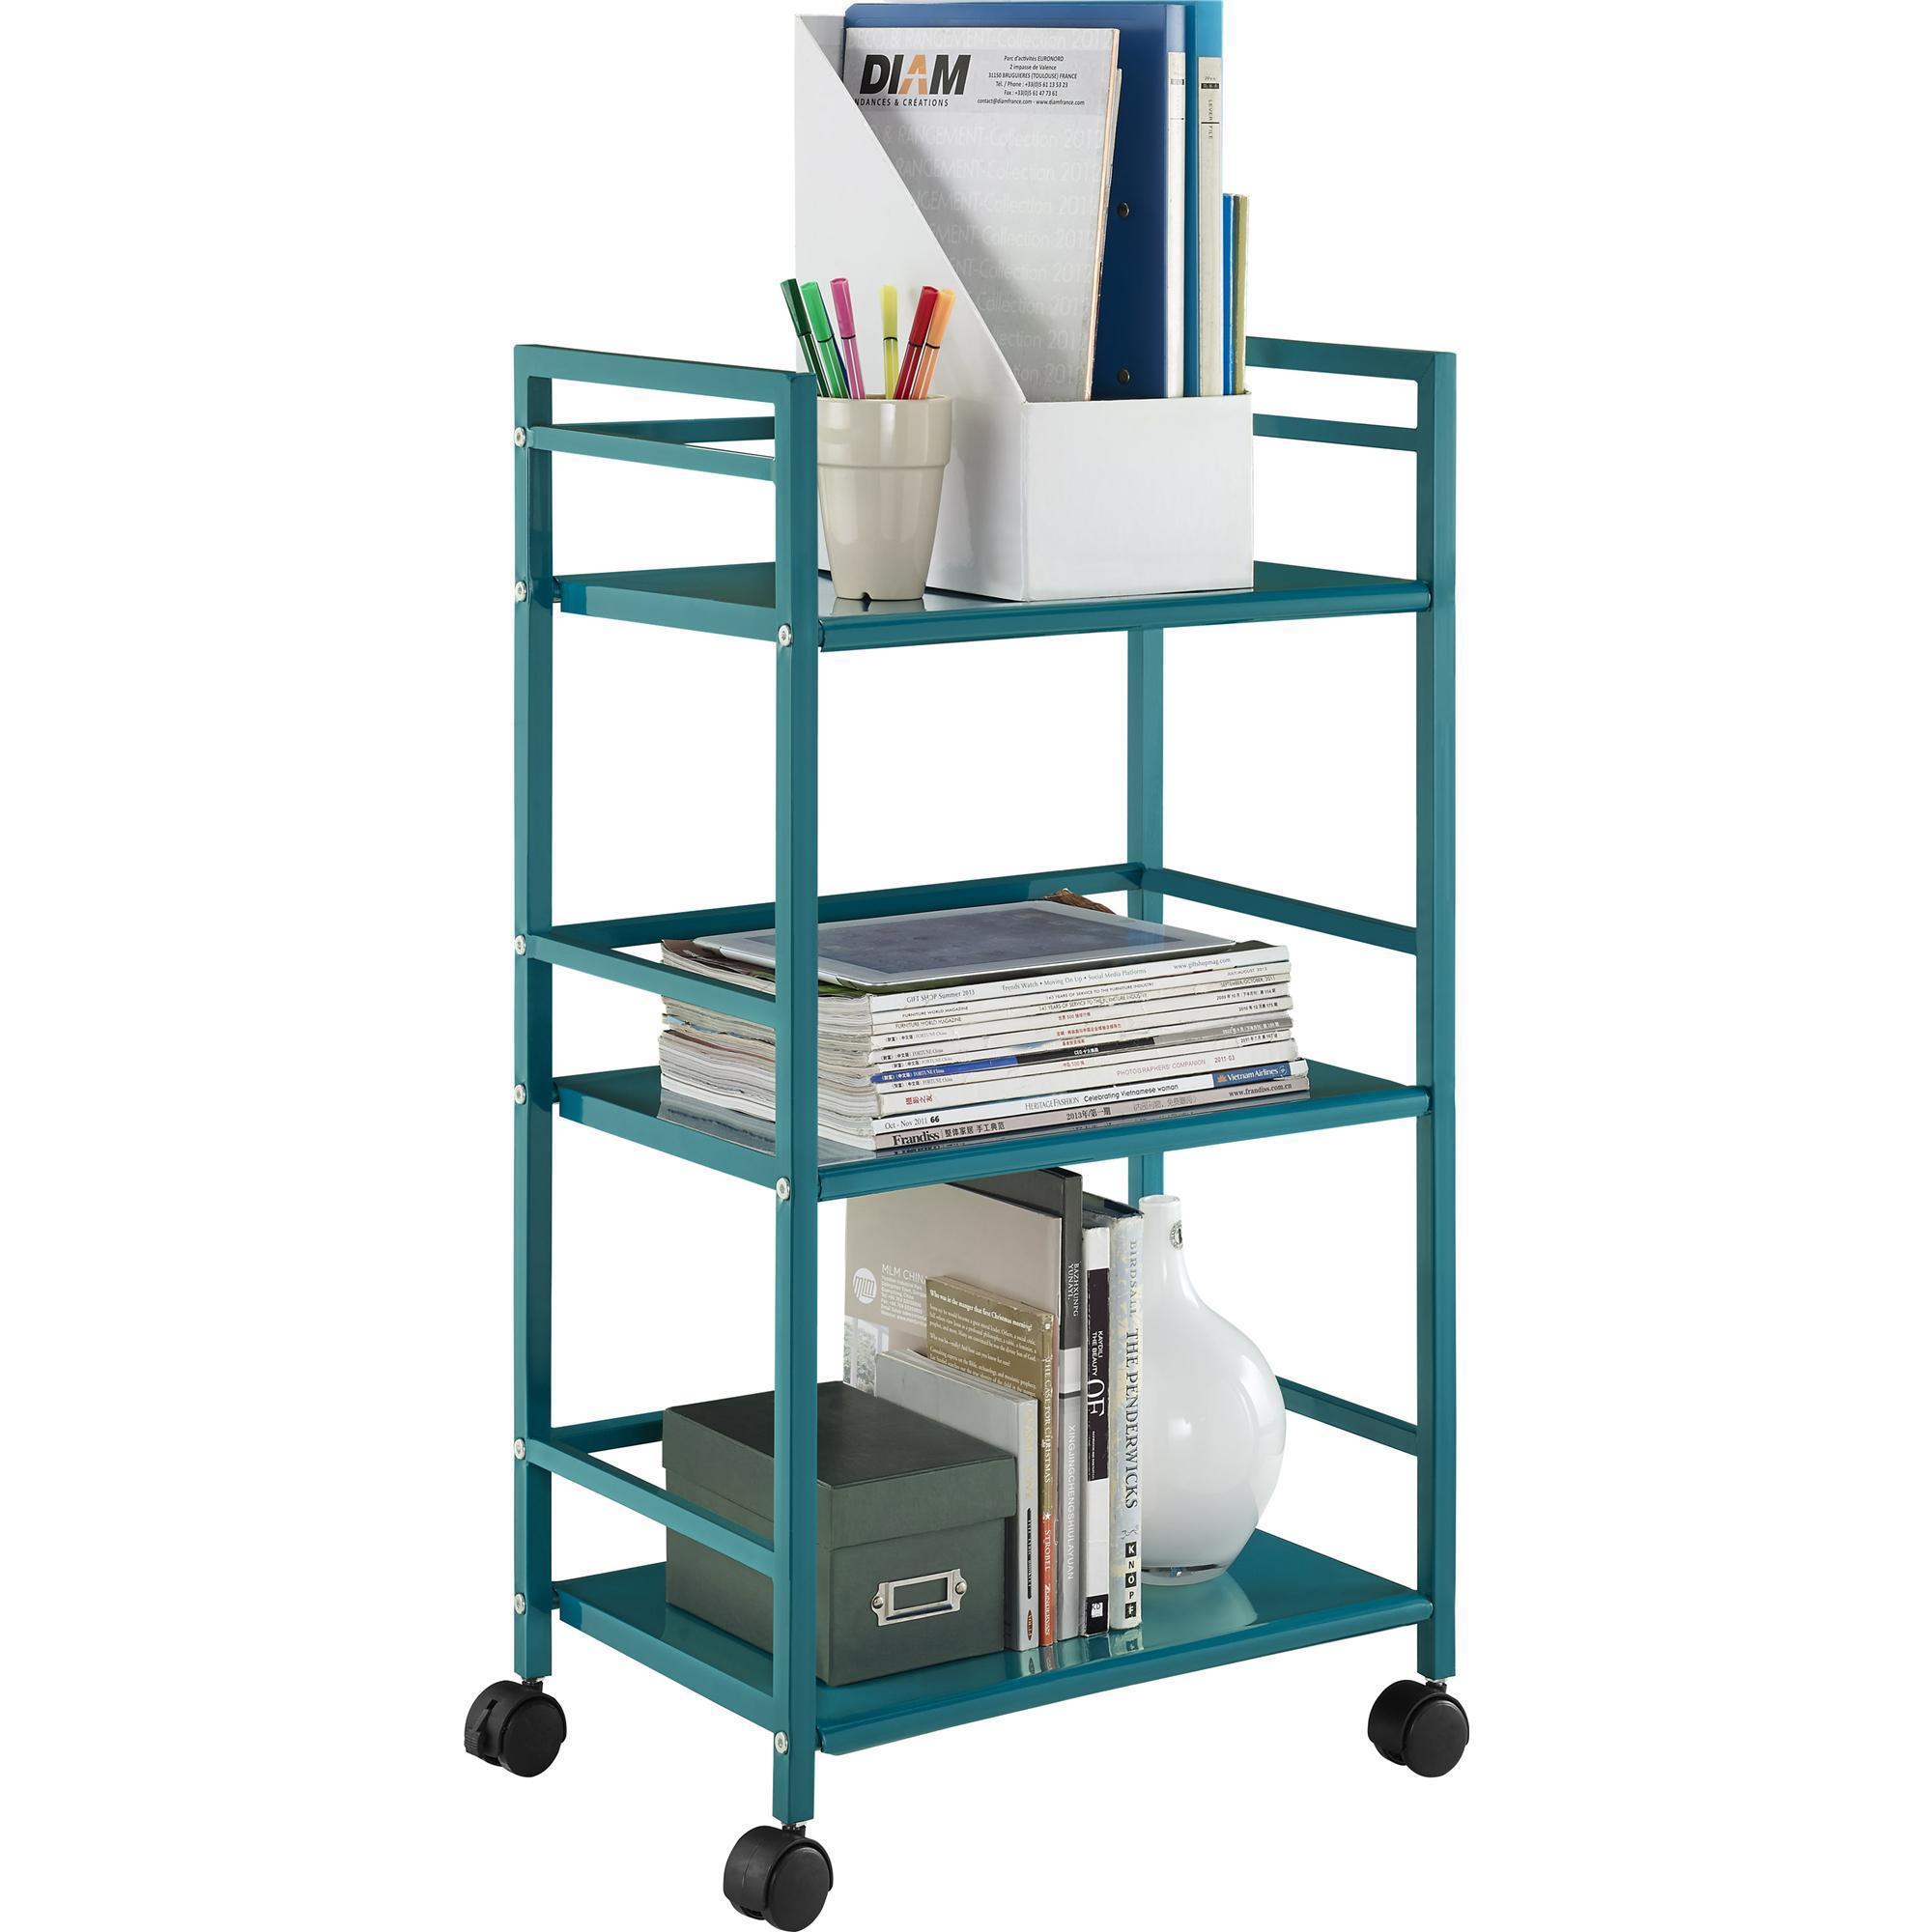 shop porch den wicker park julian 3 shelf rolling utility cart free shipping today overstockcom 20339652 - Rolling Utility Cart